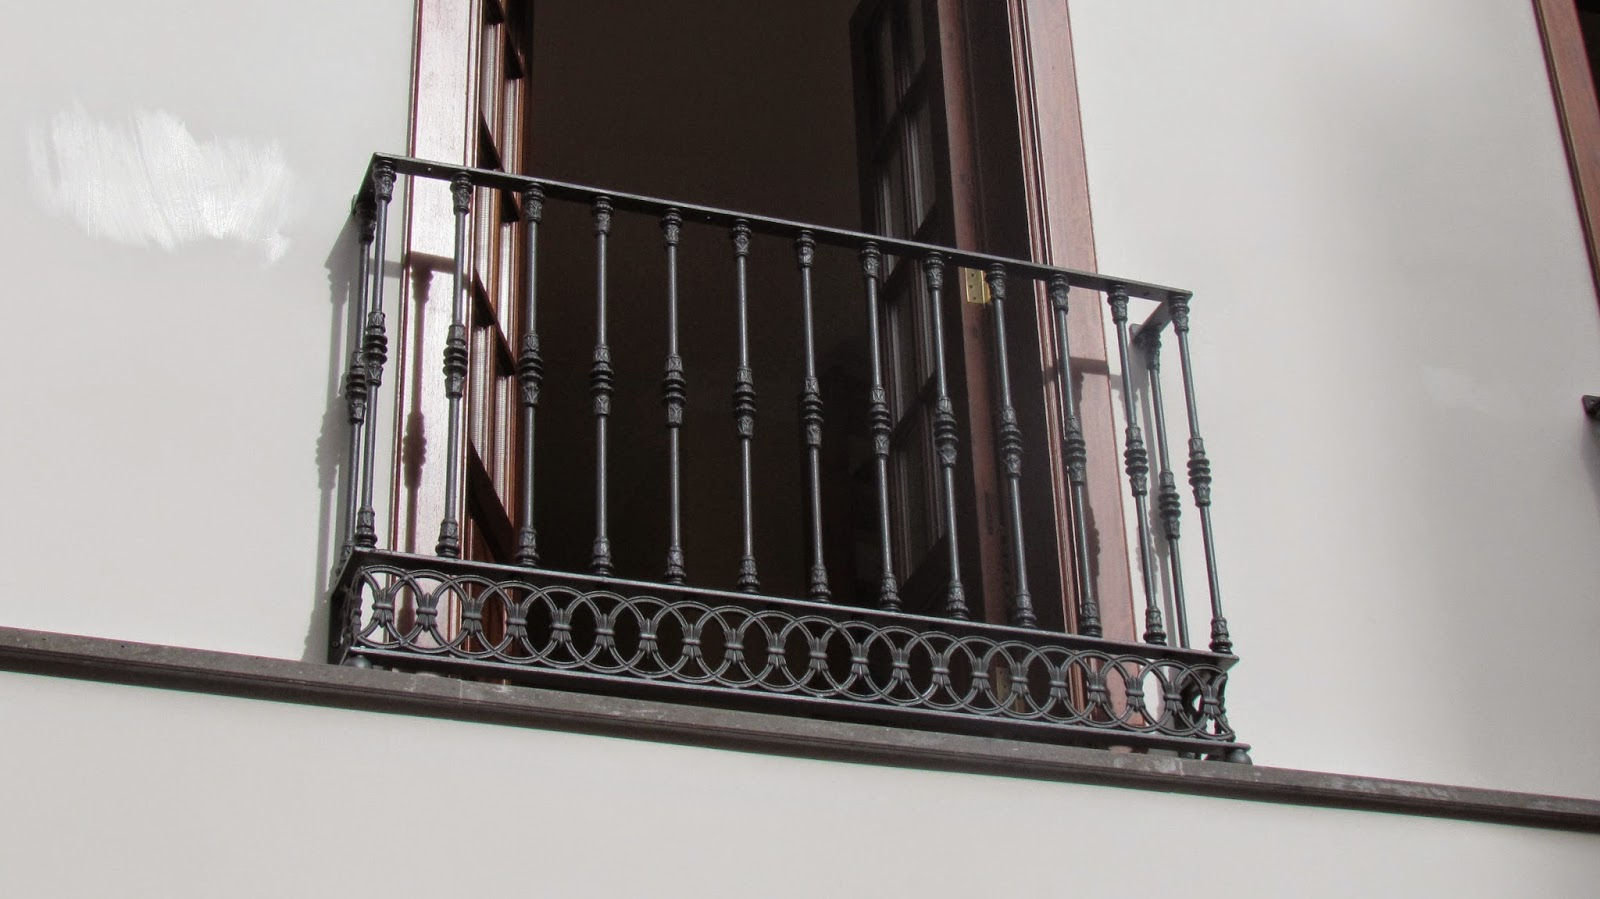 Acero inoxidable tenerife balcones forja tenerife - Balcones de forja antiguos ...